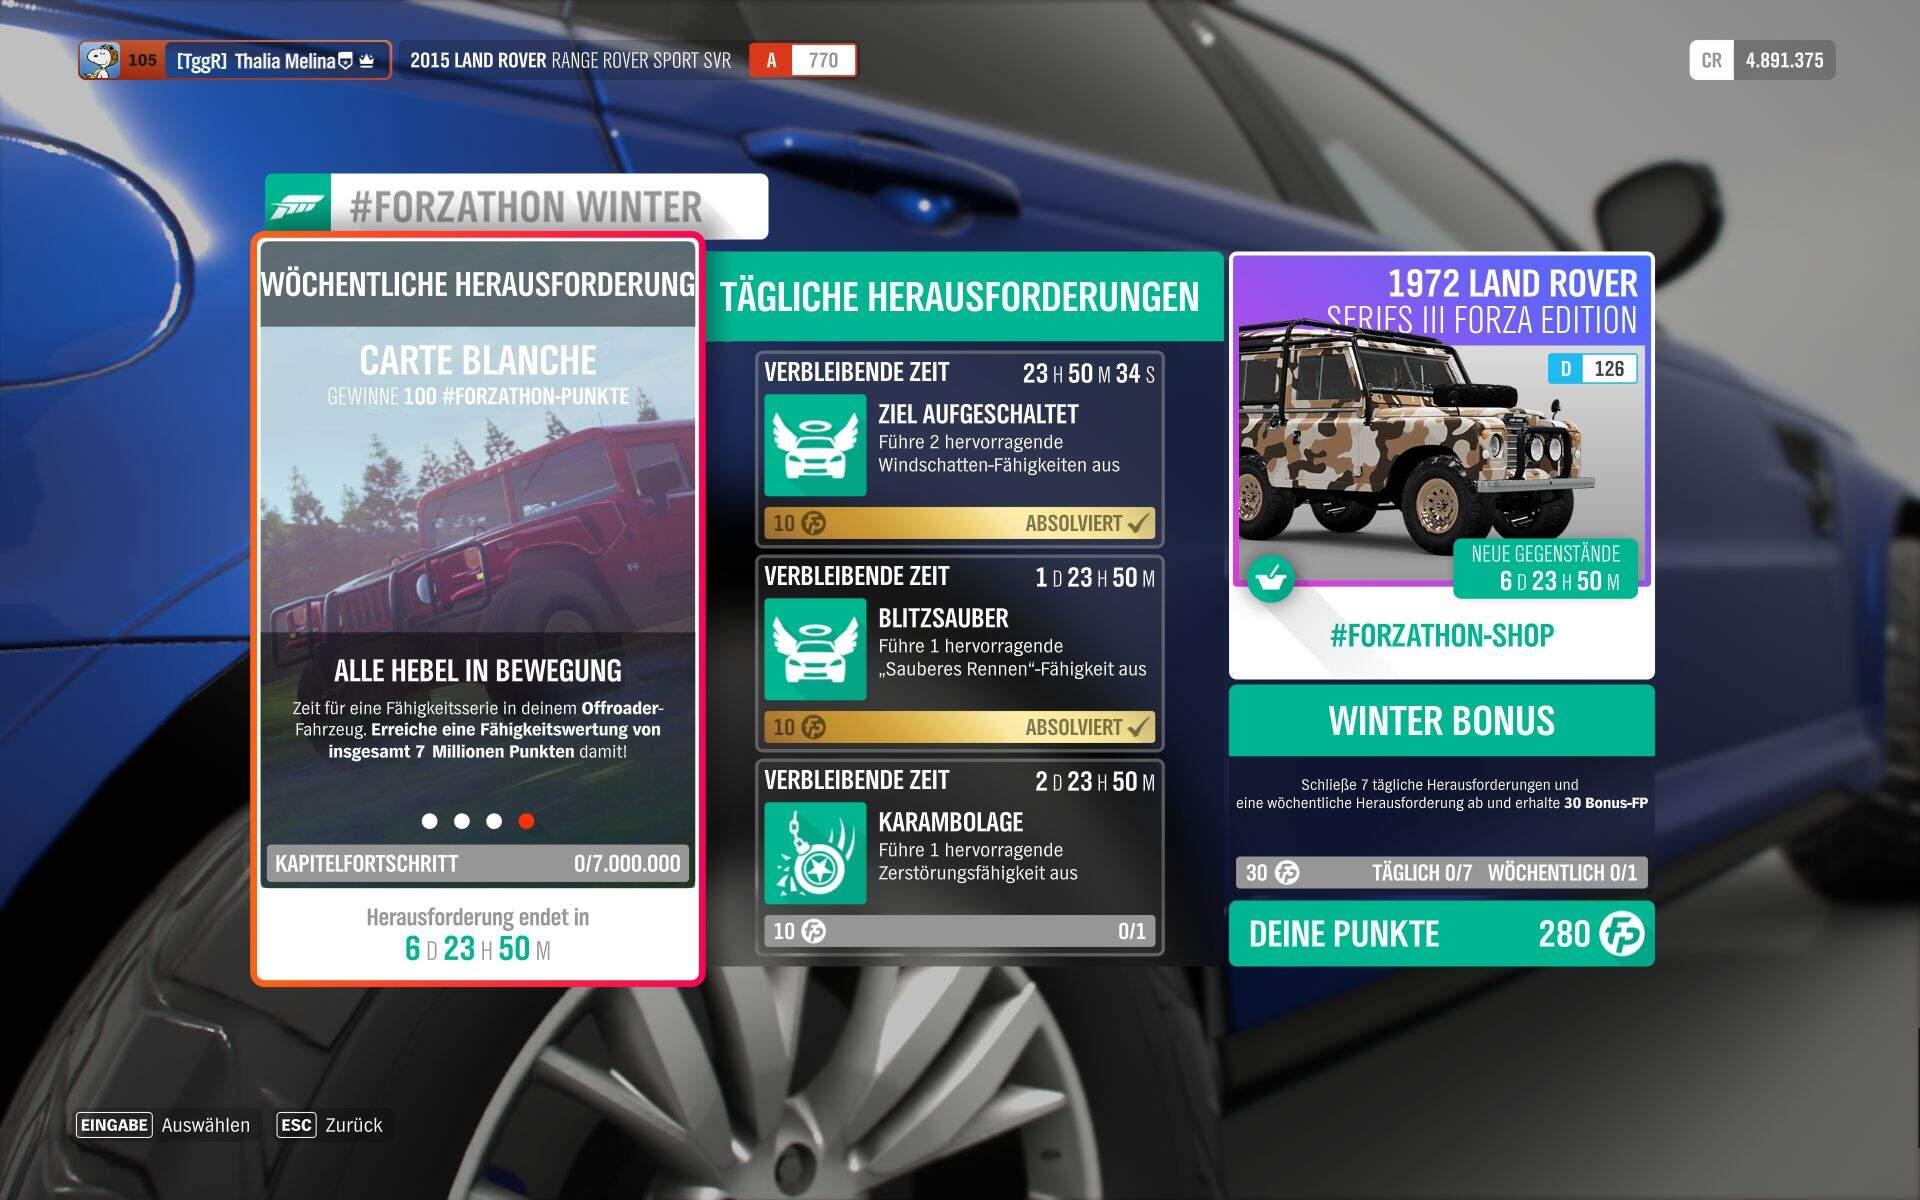 Forza Horizon 4 #Forzathon Guide KW 41 – Carte Blanche Aufgabe 4